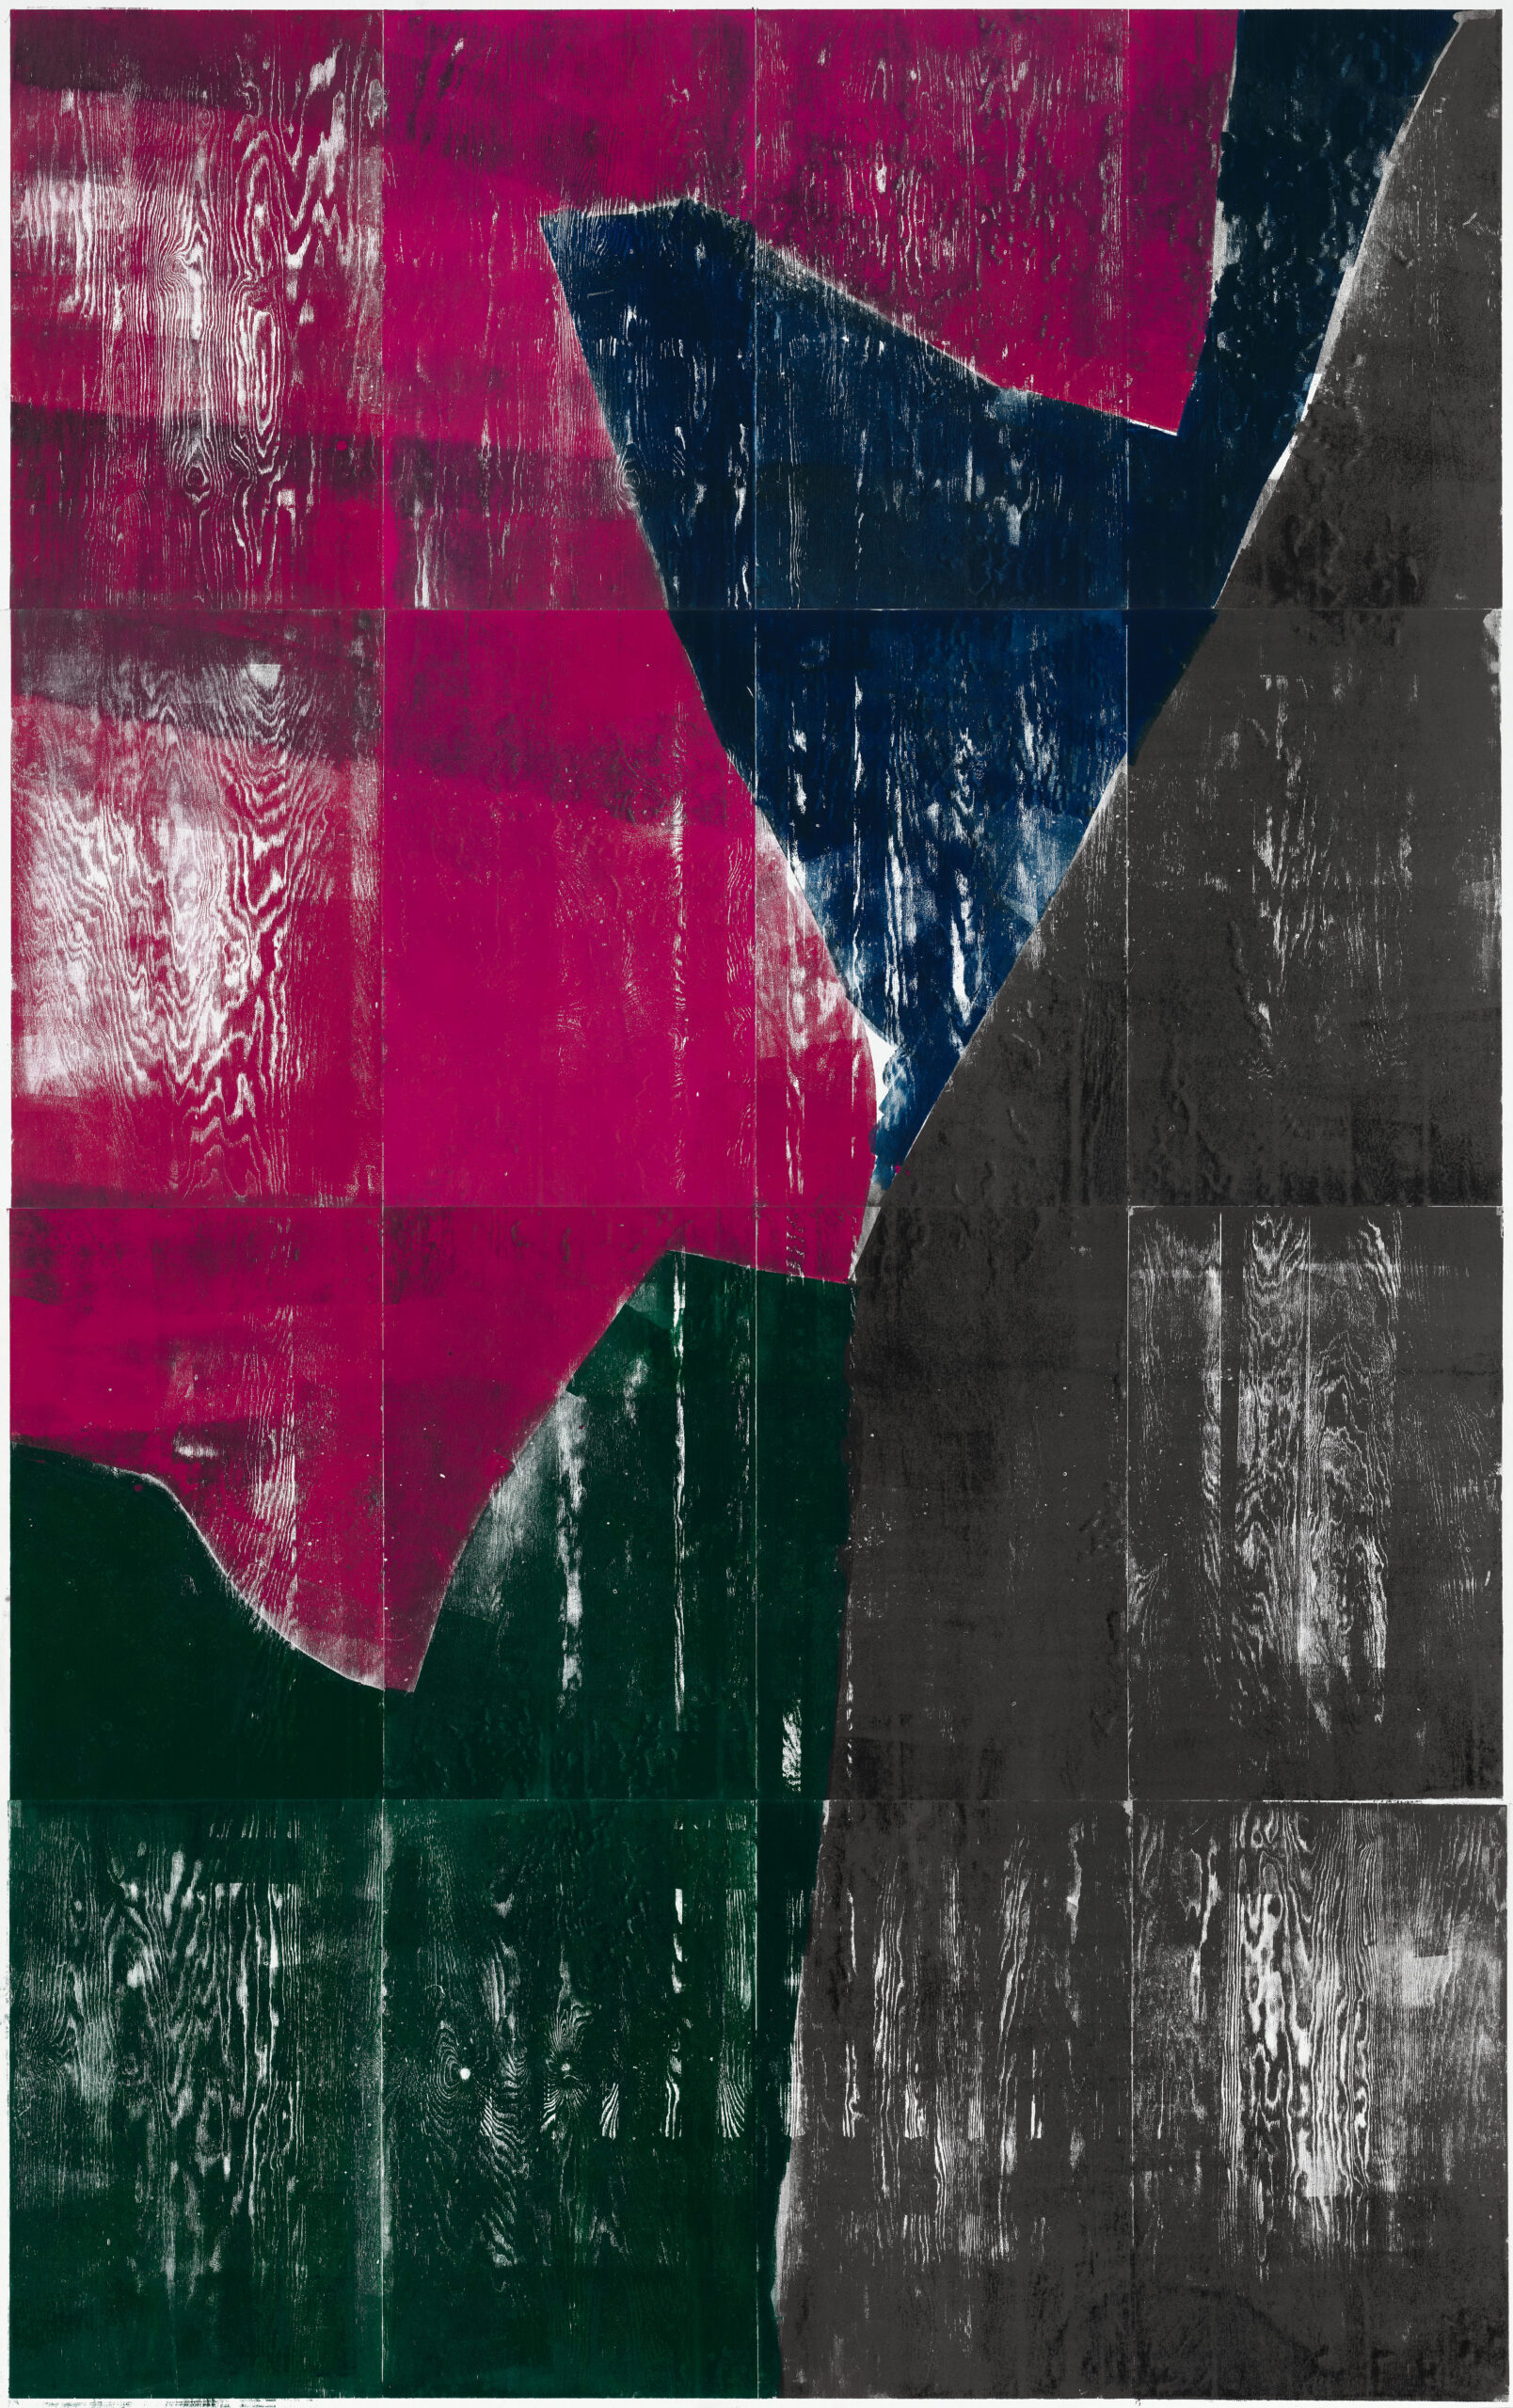 Farbkreis 6, 2020, wood engraving, 391,8 x 257,5 cm